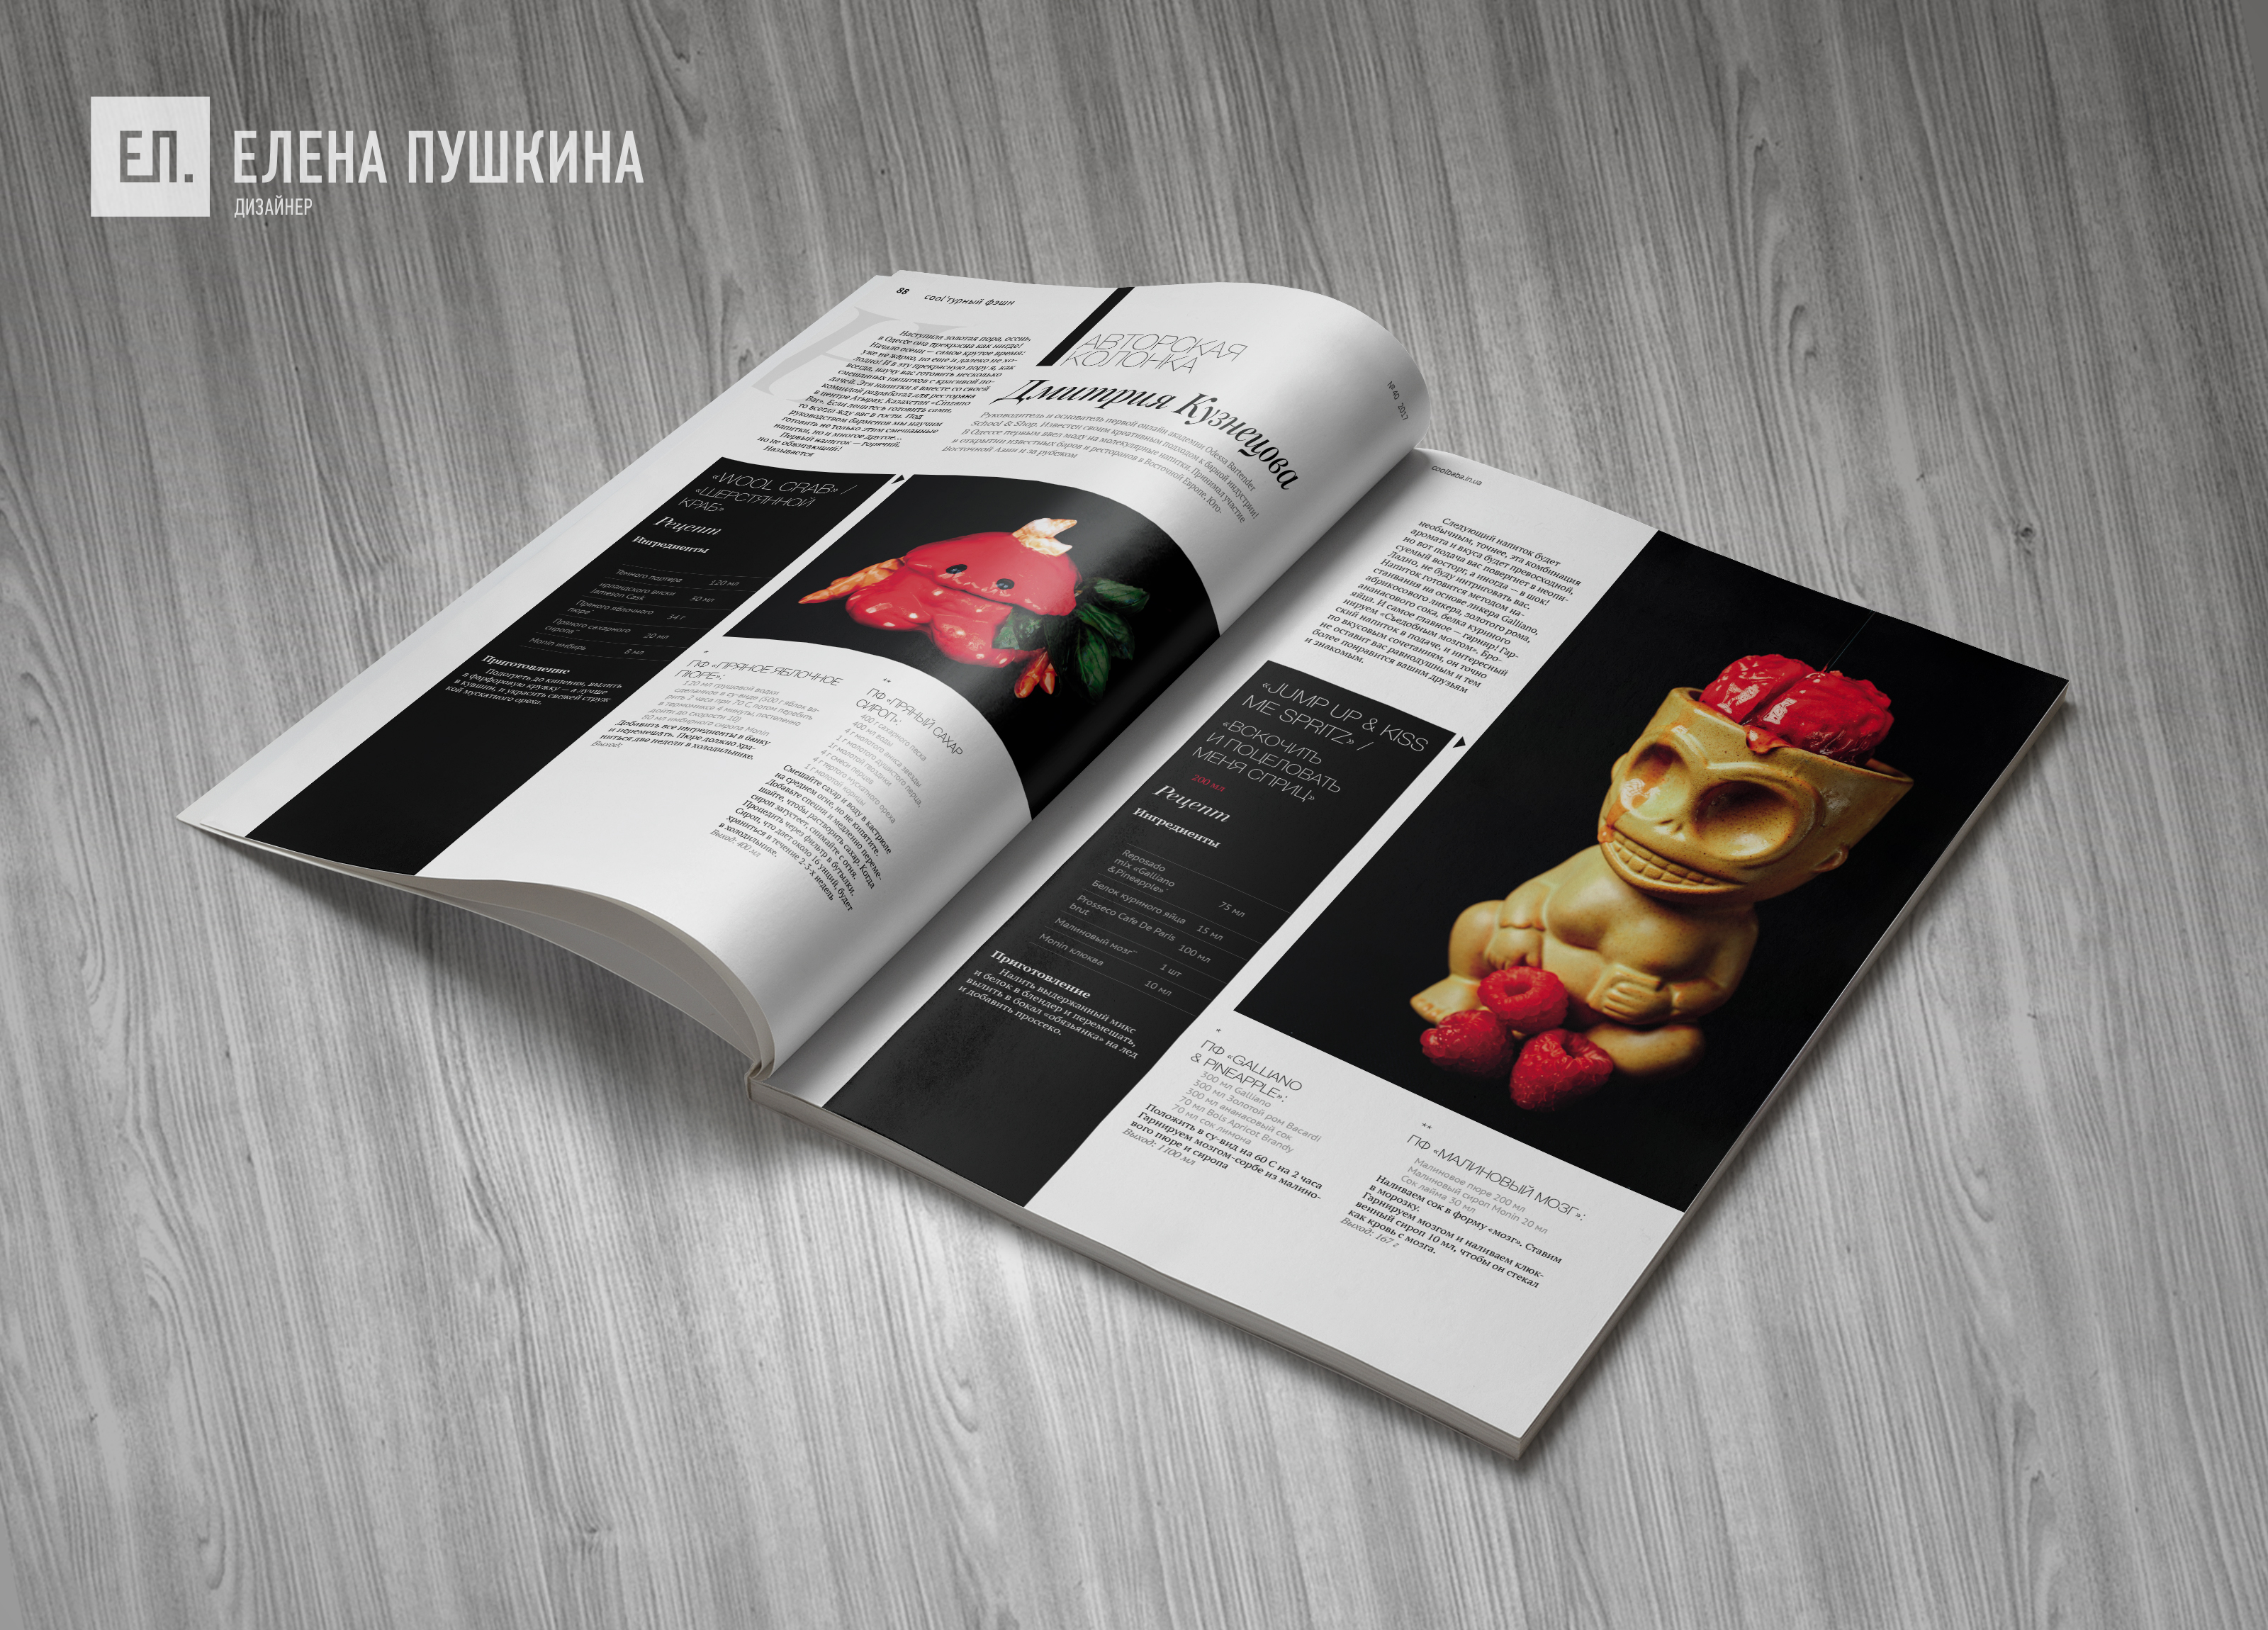 Глянцевый журнал «CoolBaba» №40 сентябрь 2017— разработка дизайна ивёрстка журнала Разработка журналов Портфолио